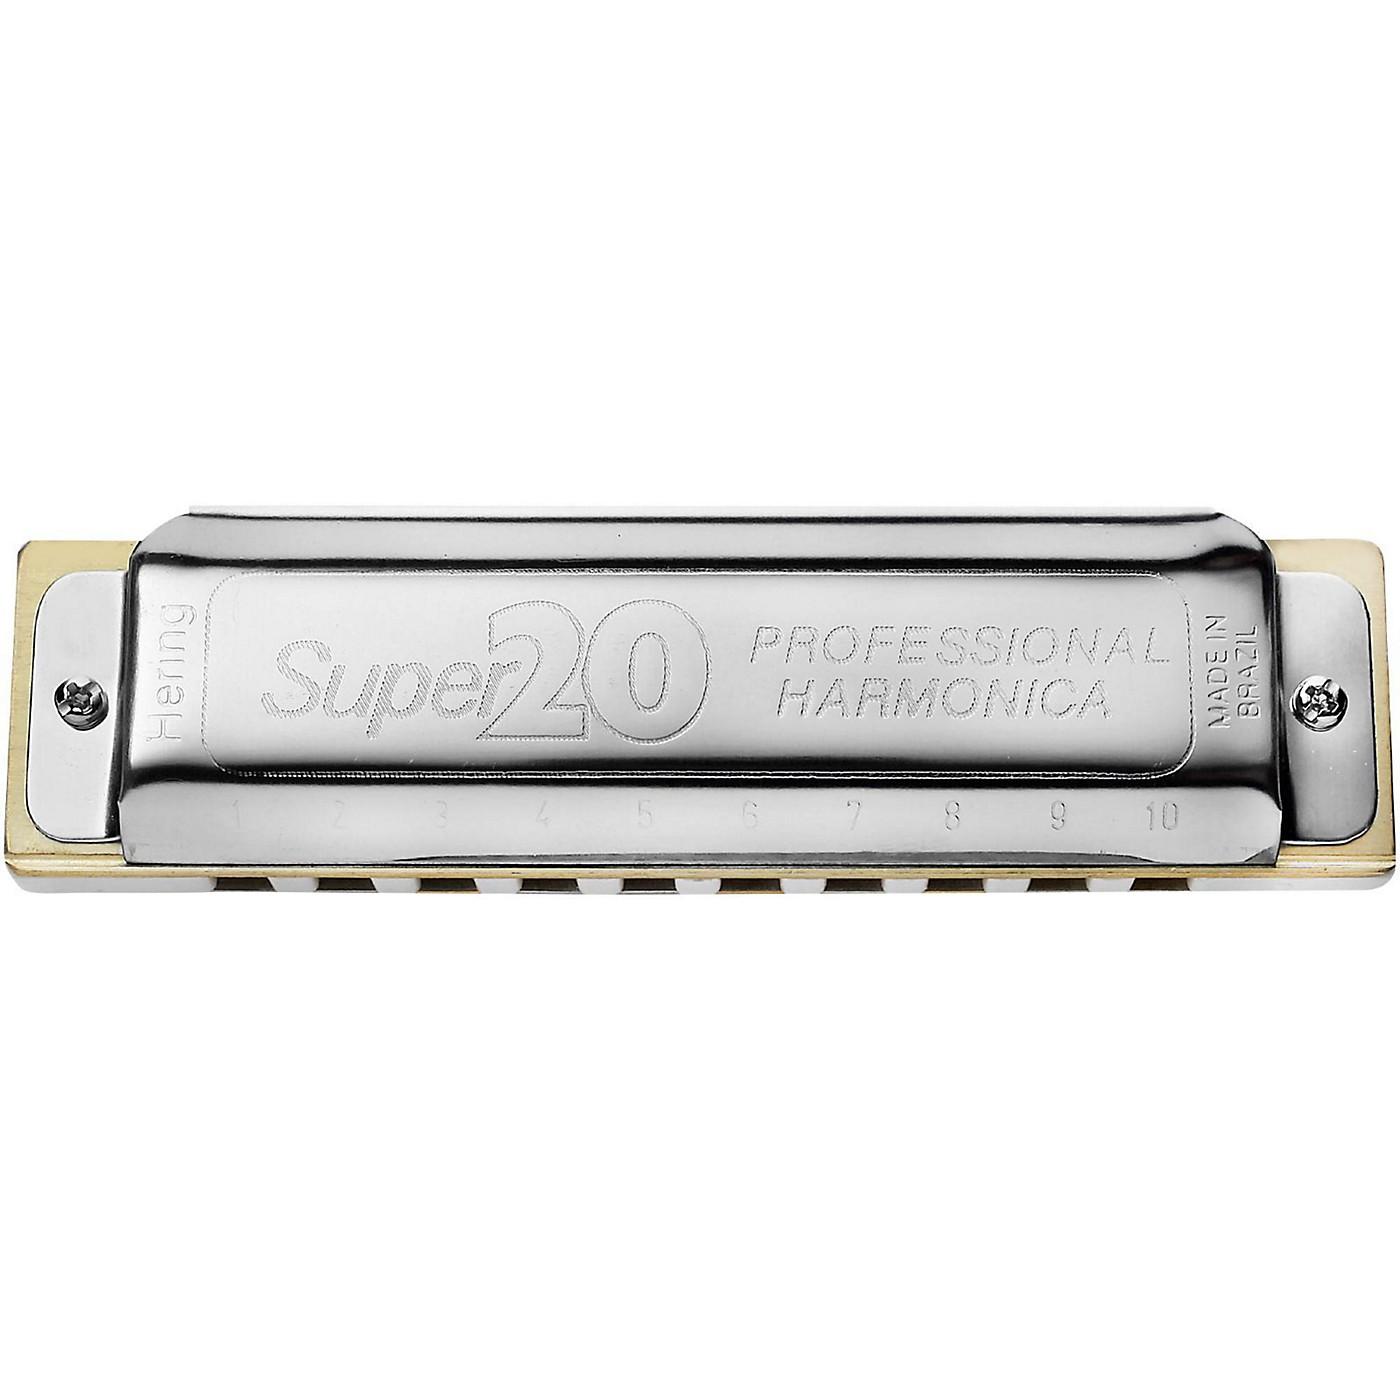 Hering Harmonicas 8020 Super 20 Diatonic Harmonica thumbnail